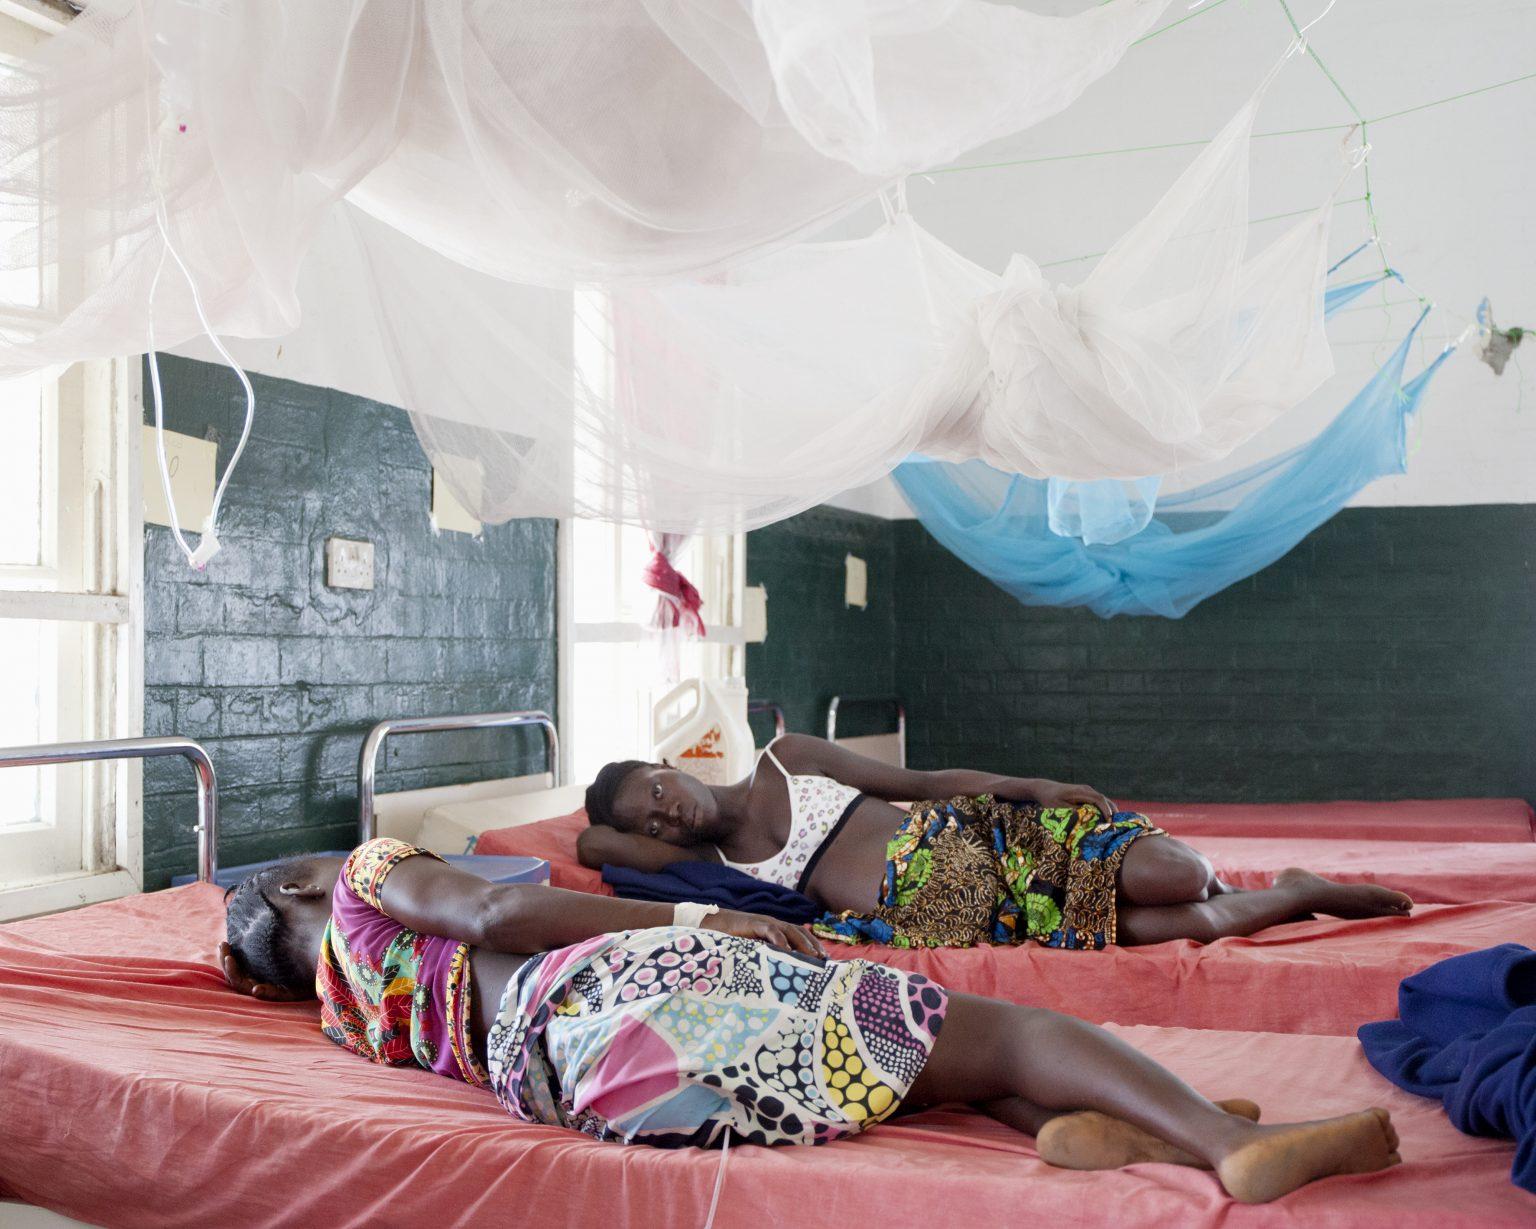 Bonthe (Sierra Leone). In Bonthe hospital, Francess and Kadi rest in the maternity ward. >< Bonthe (Sierra Leone). All'ospedale di Bonthe, Francess e Kadi riposano nel reparto maternità.